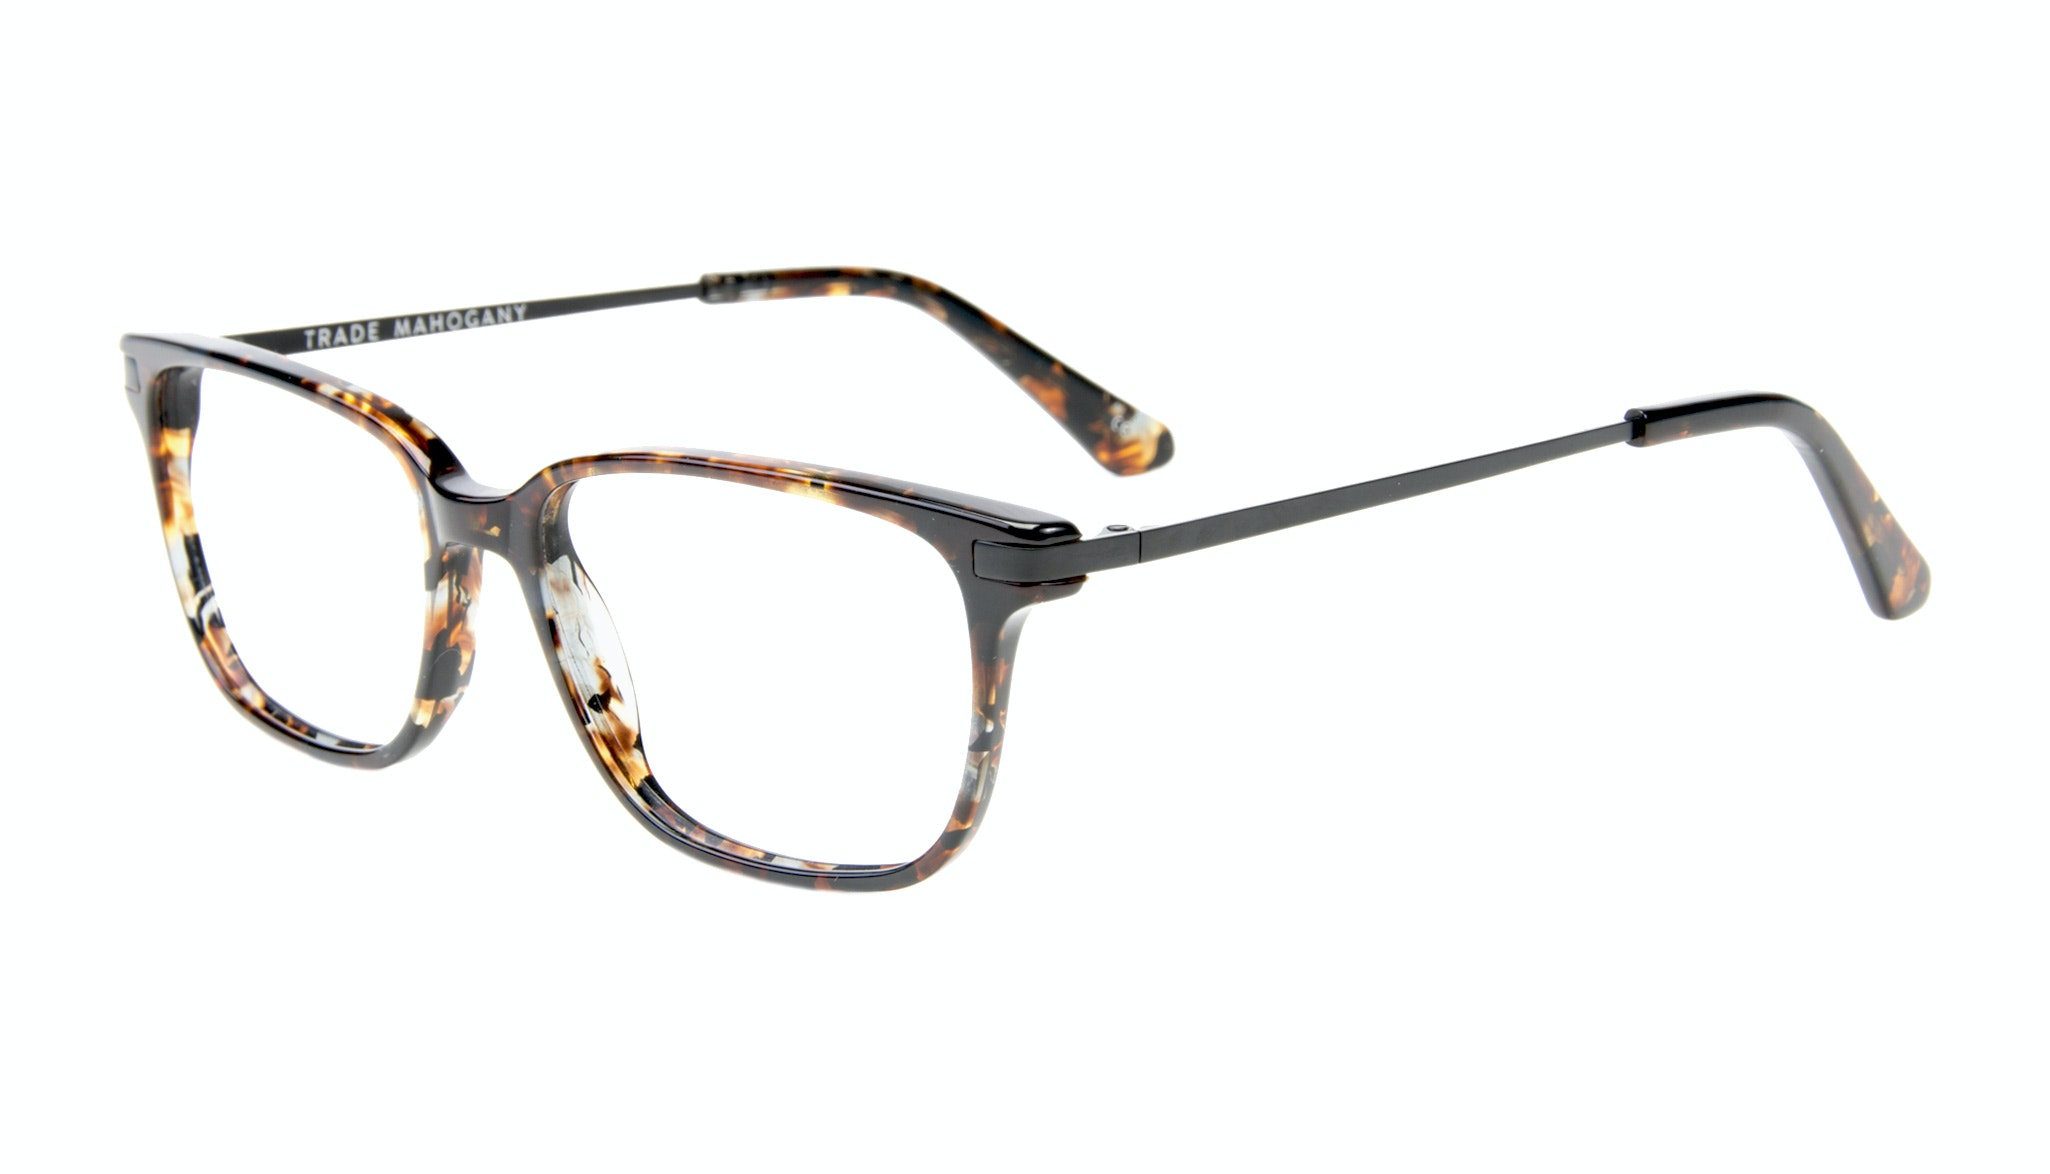 Affordable Fashion Glasses Rectangle Eyeglasses Men Trade Mahogany Tilt